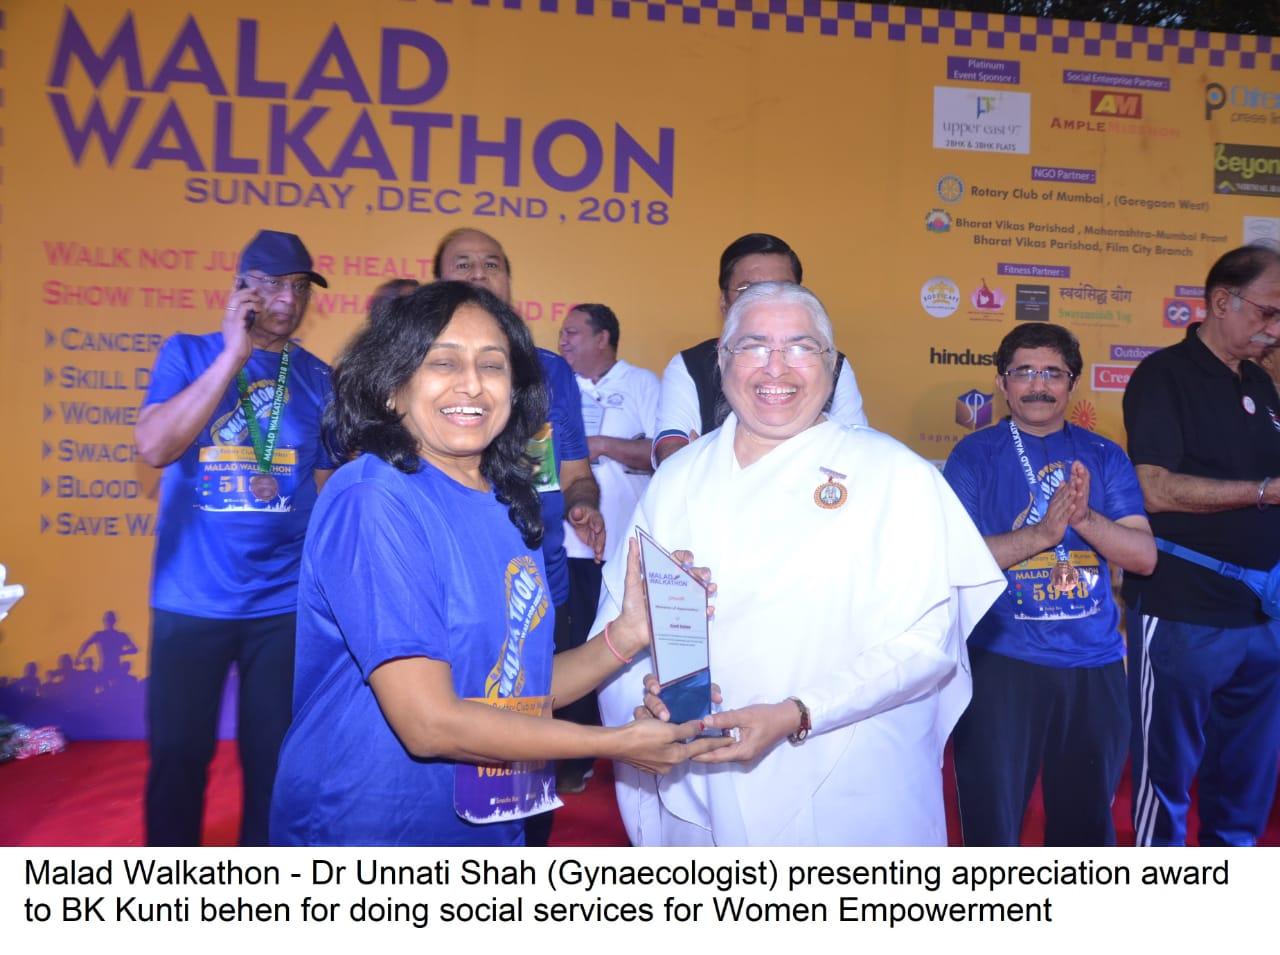 Brahma Kumaris Felicitated with Appreciation Award